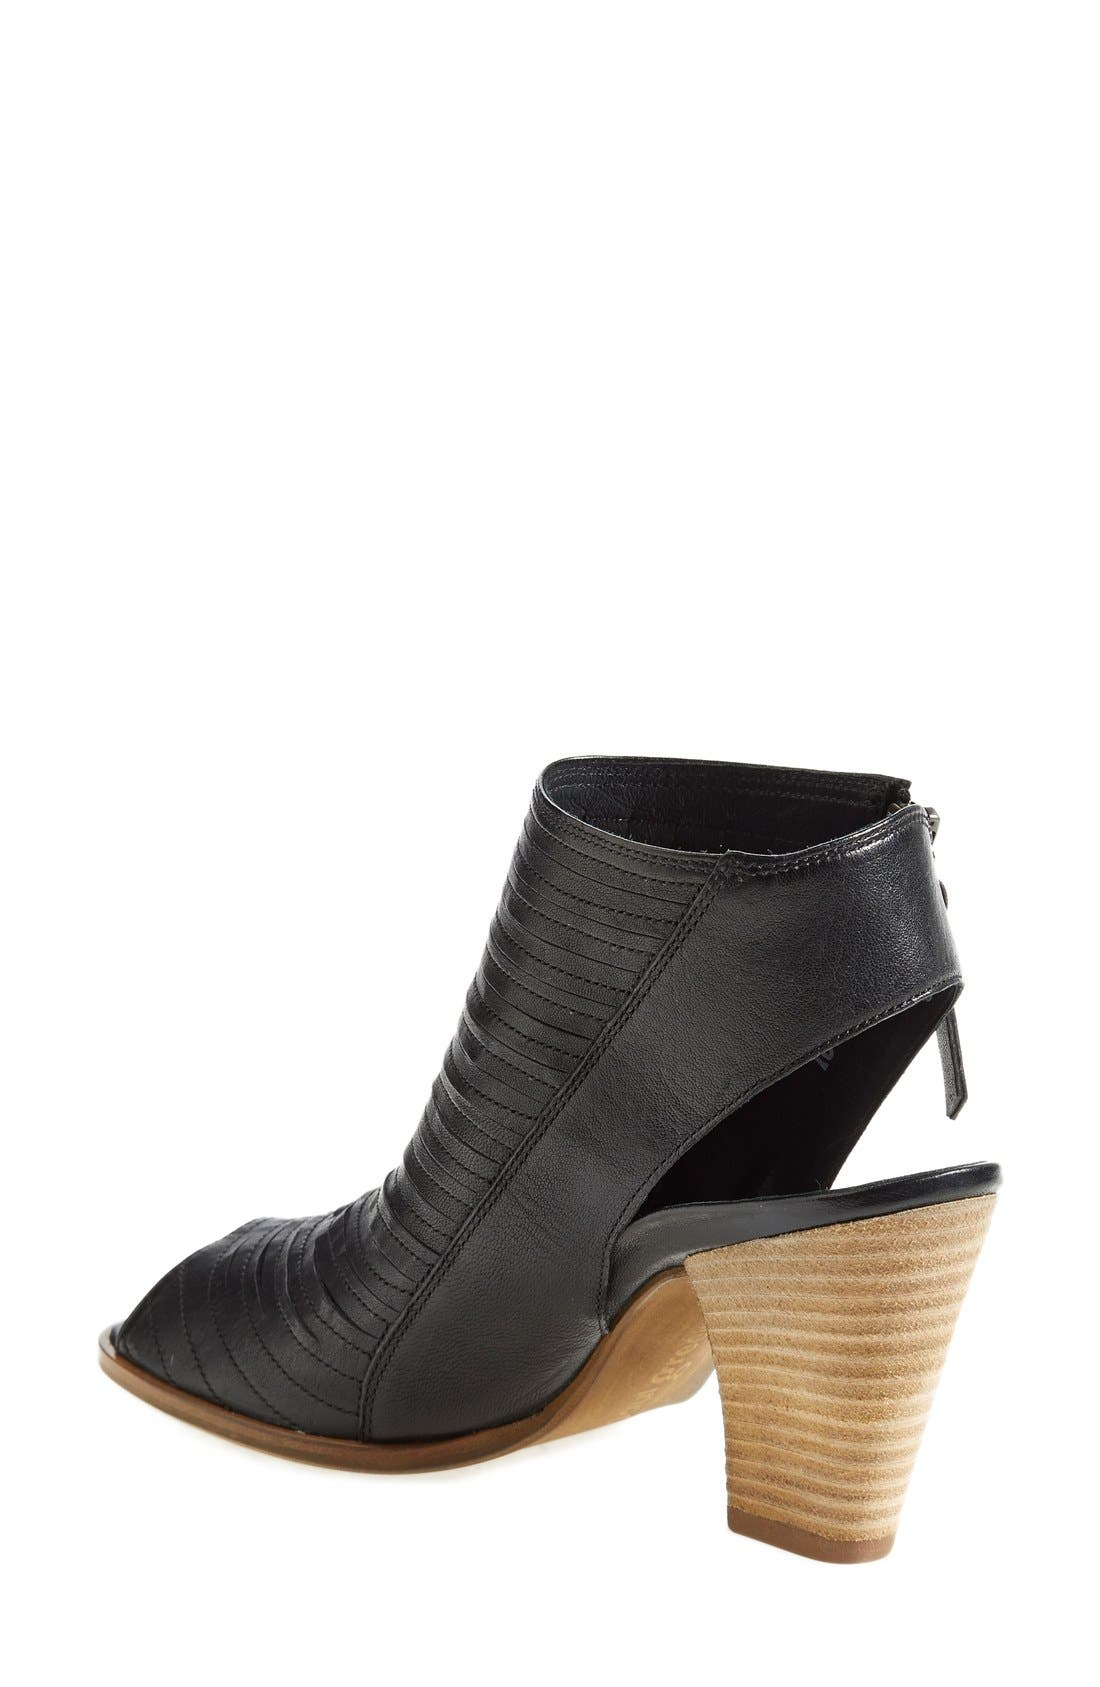 'Cayanne' Leather Peep Toe Sandal,                             Alternate thumbnail 32, color,